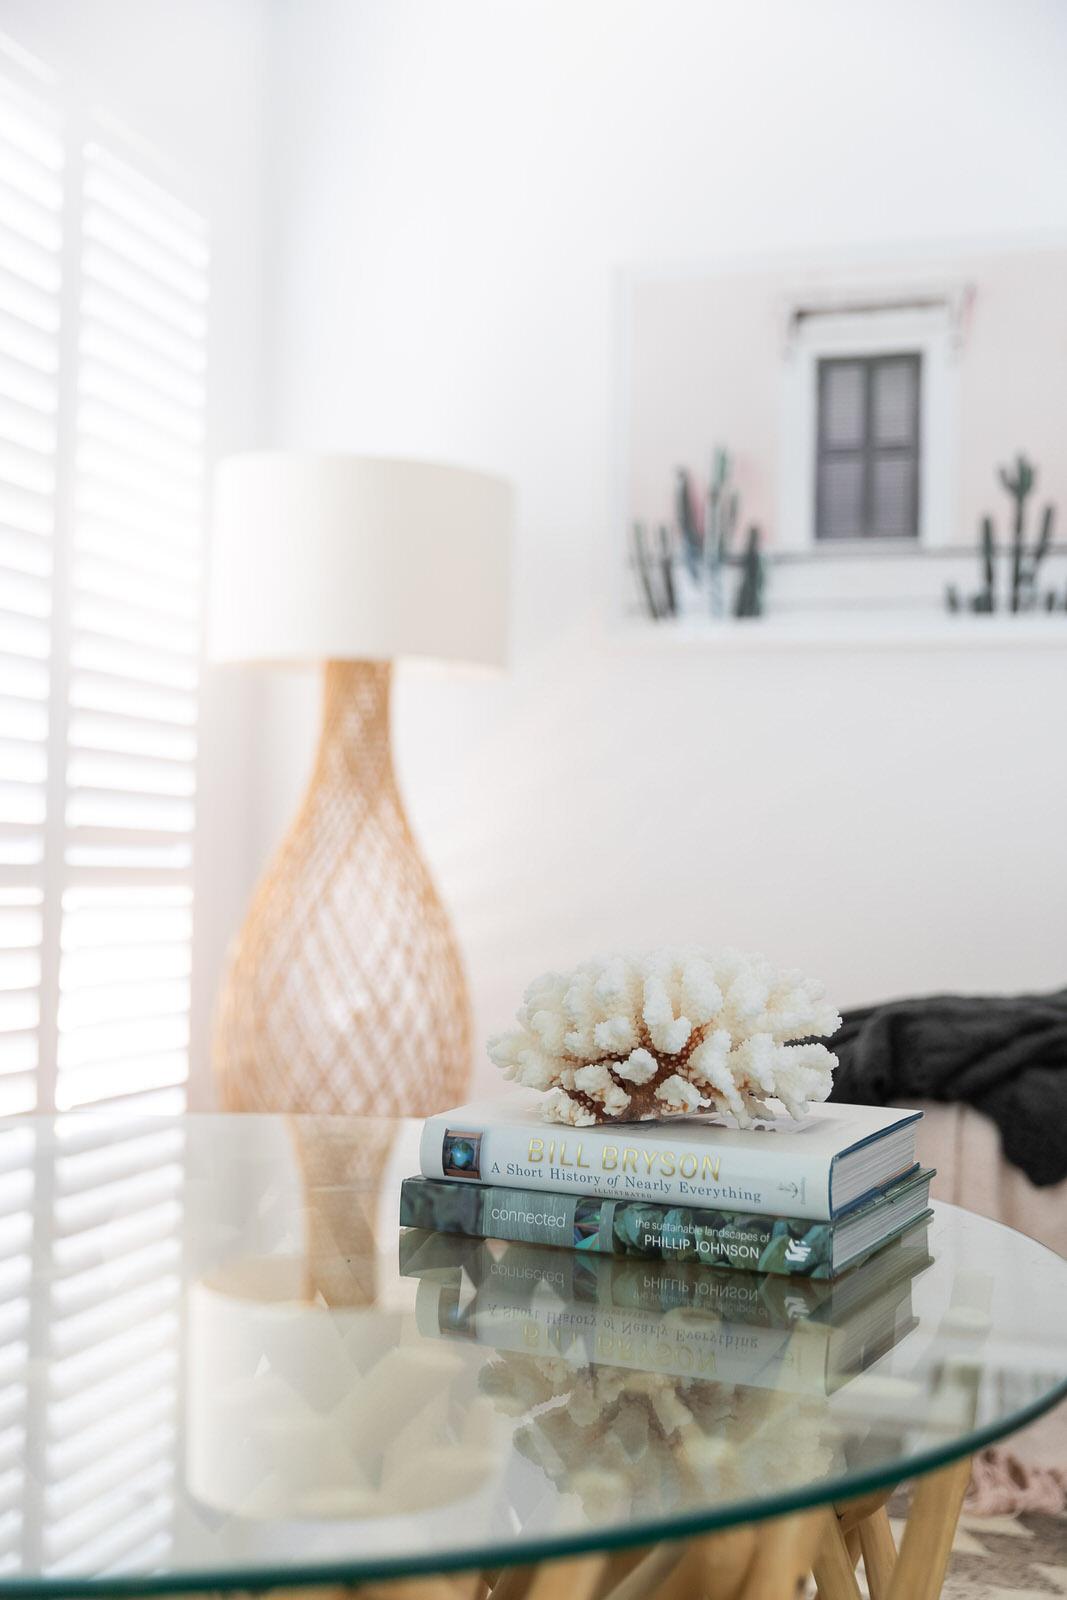 Ammon_Creative-Interior_Photography-Real_Estate-Hatch_Interiors-0121.jpg